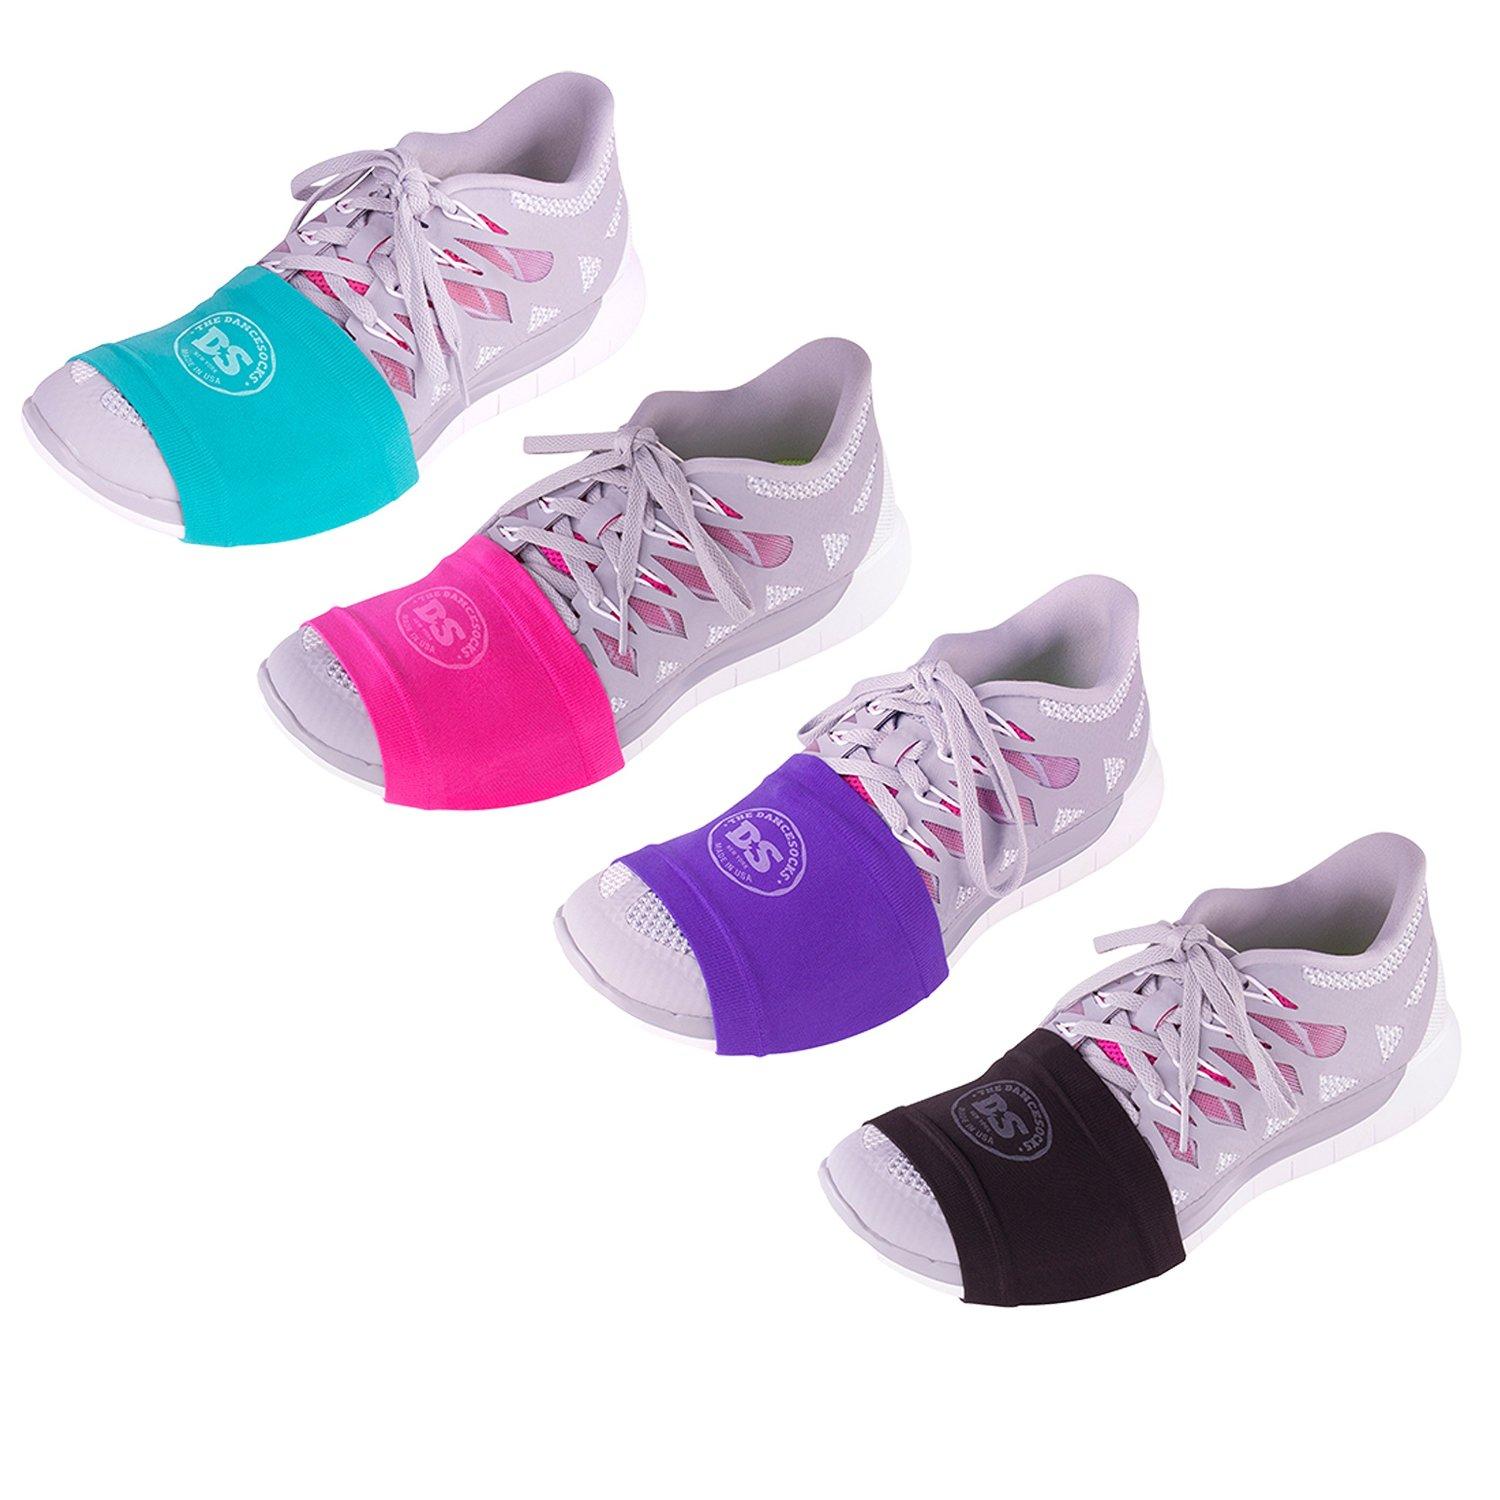 753ed5c0ec2c7 The Best Zumba Shoes